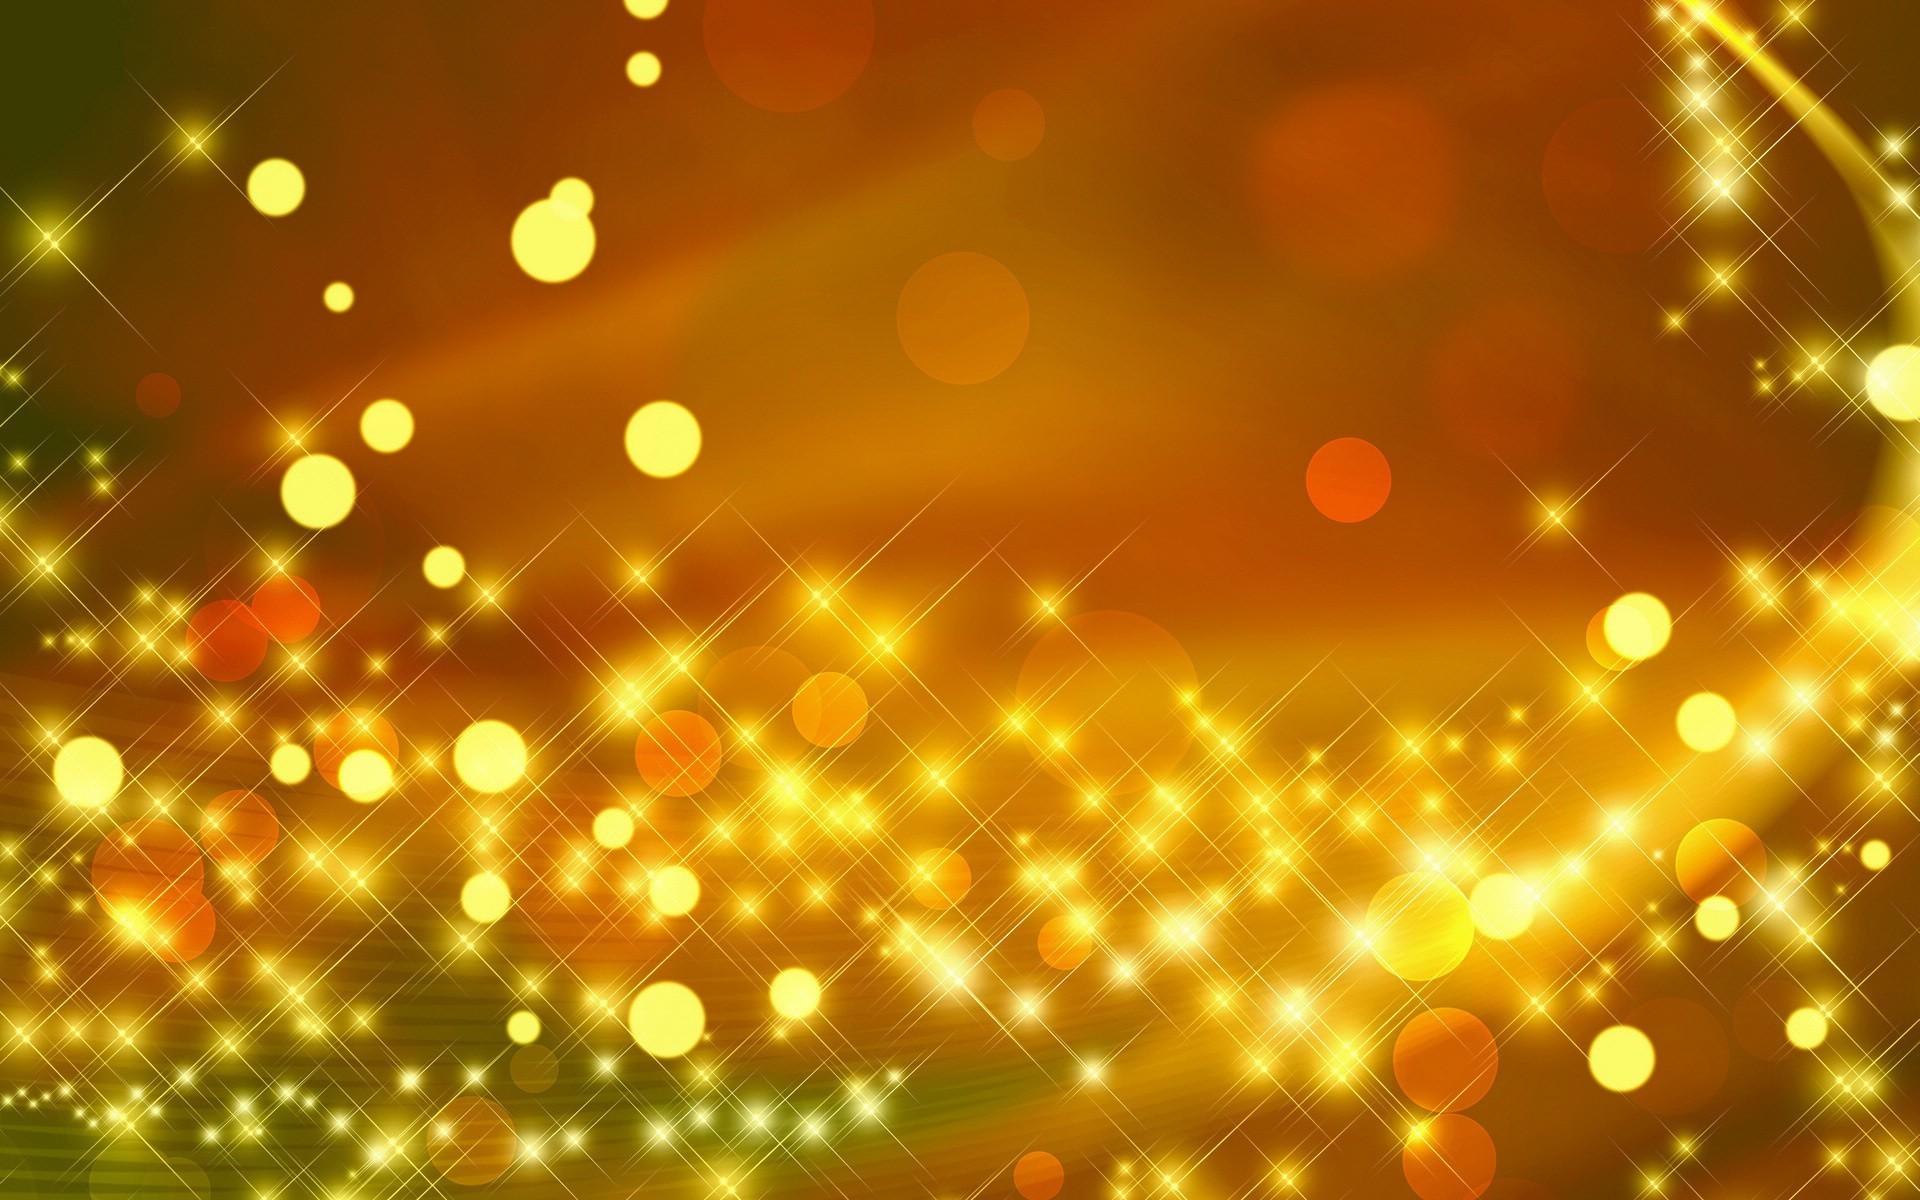 Cool Sparkle Wallpaper · Gold Sparkle Wallpaper ...